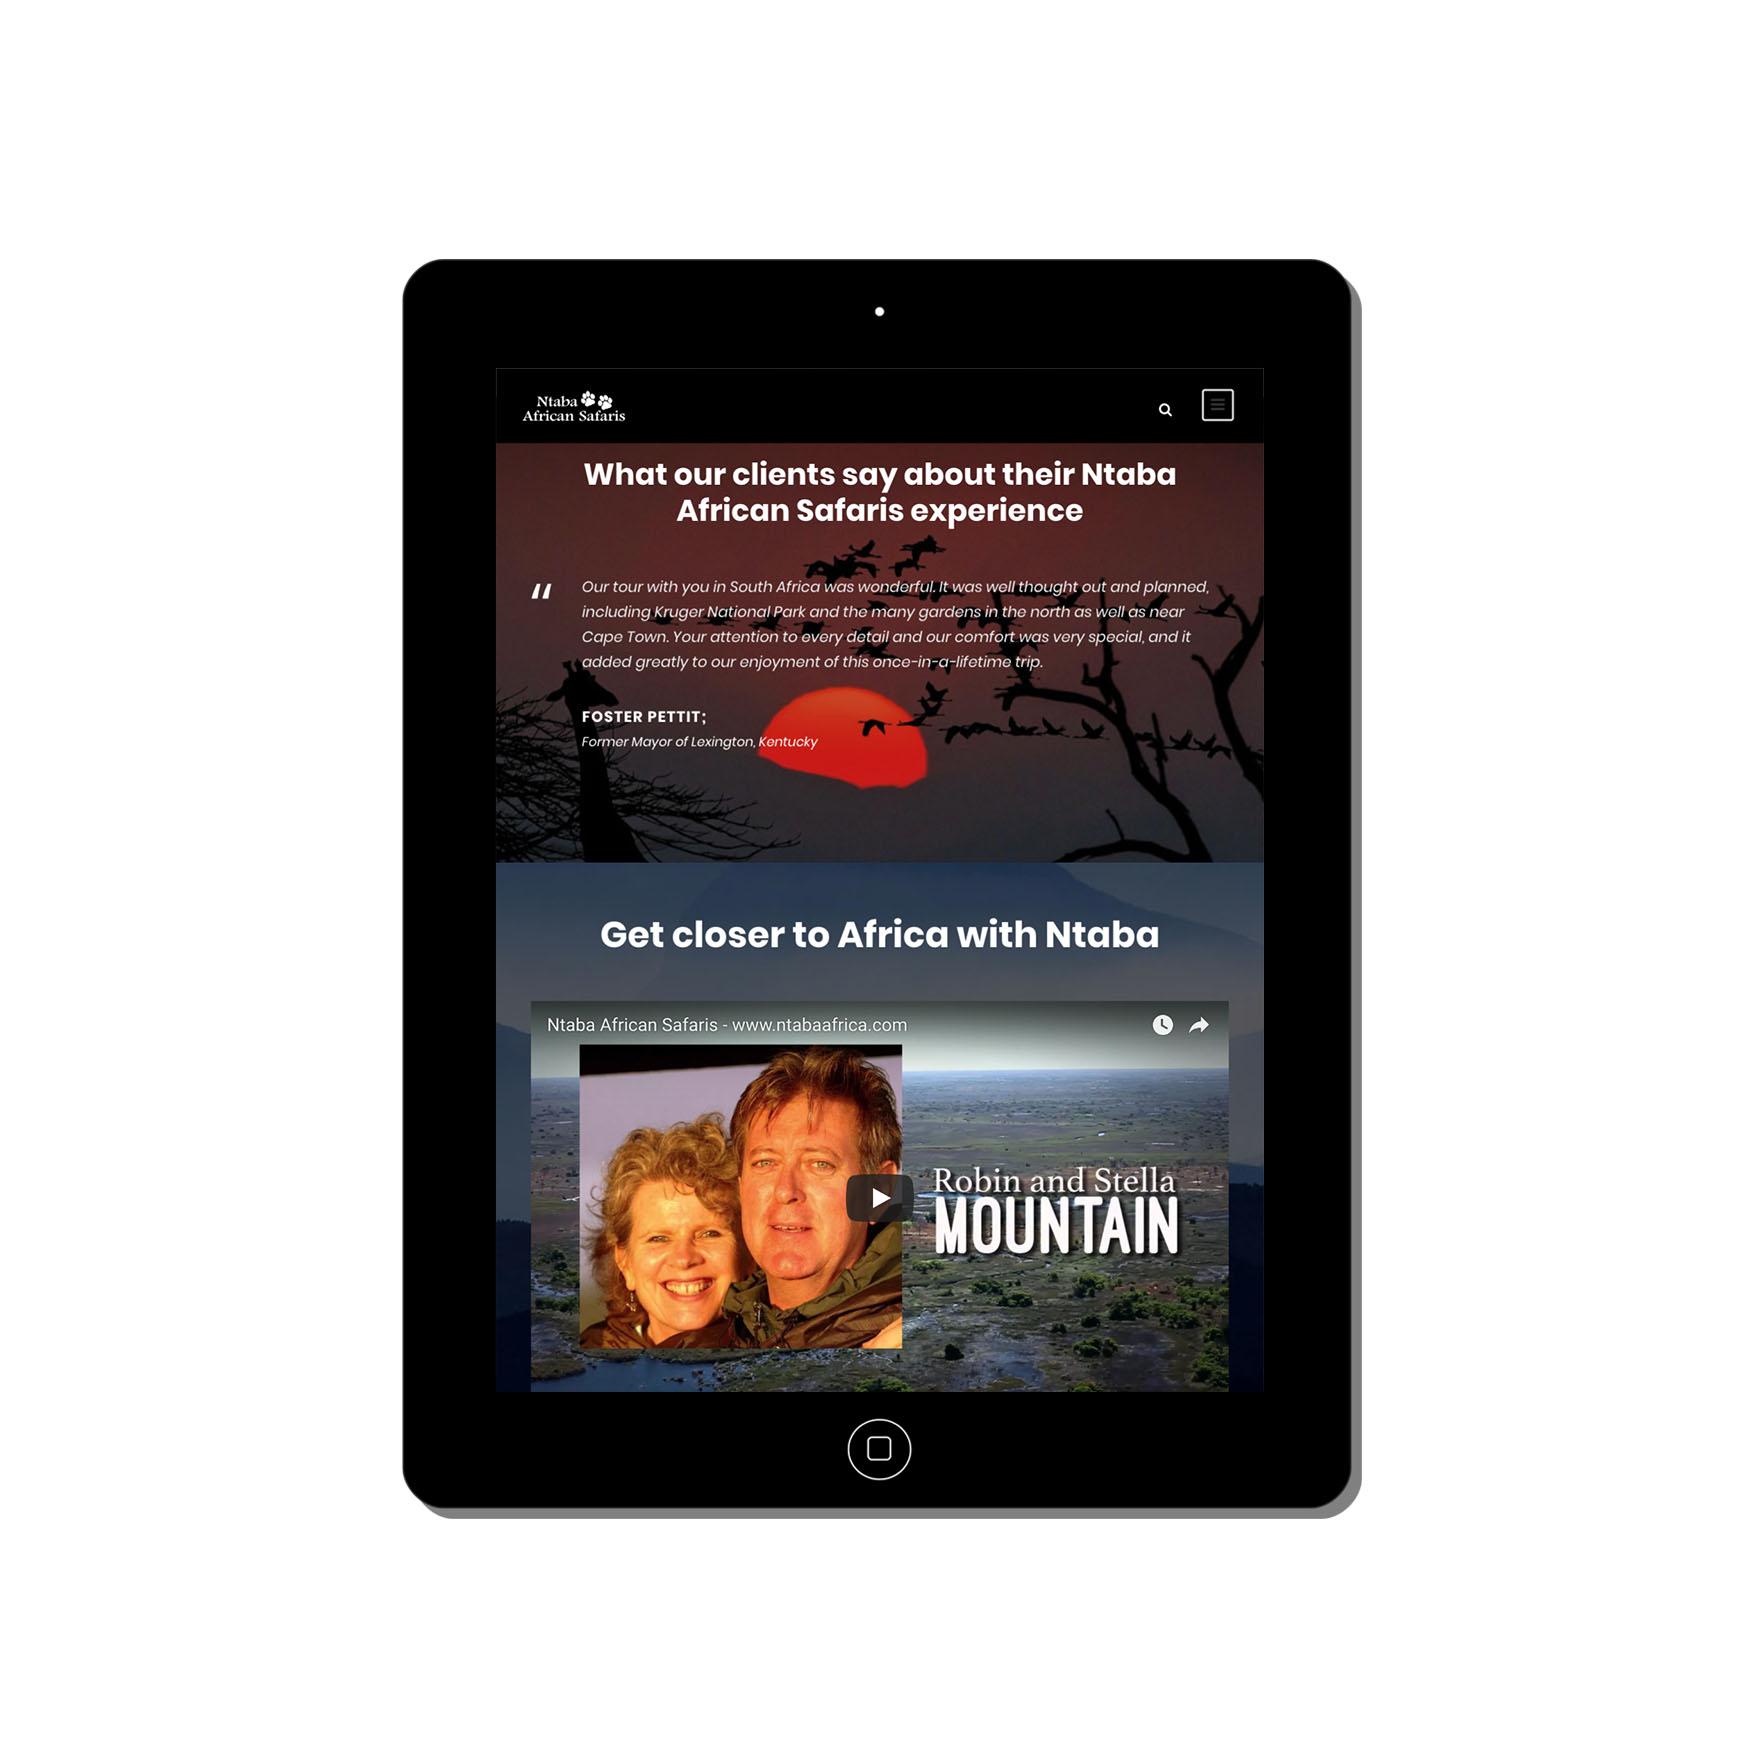 ntaba africa web-design-portfolio-webdoor-responsive-web-design-agency-hillcrest-kwazulu-natal-tablet